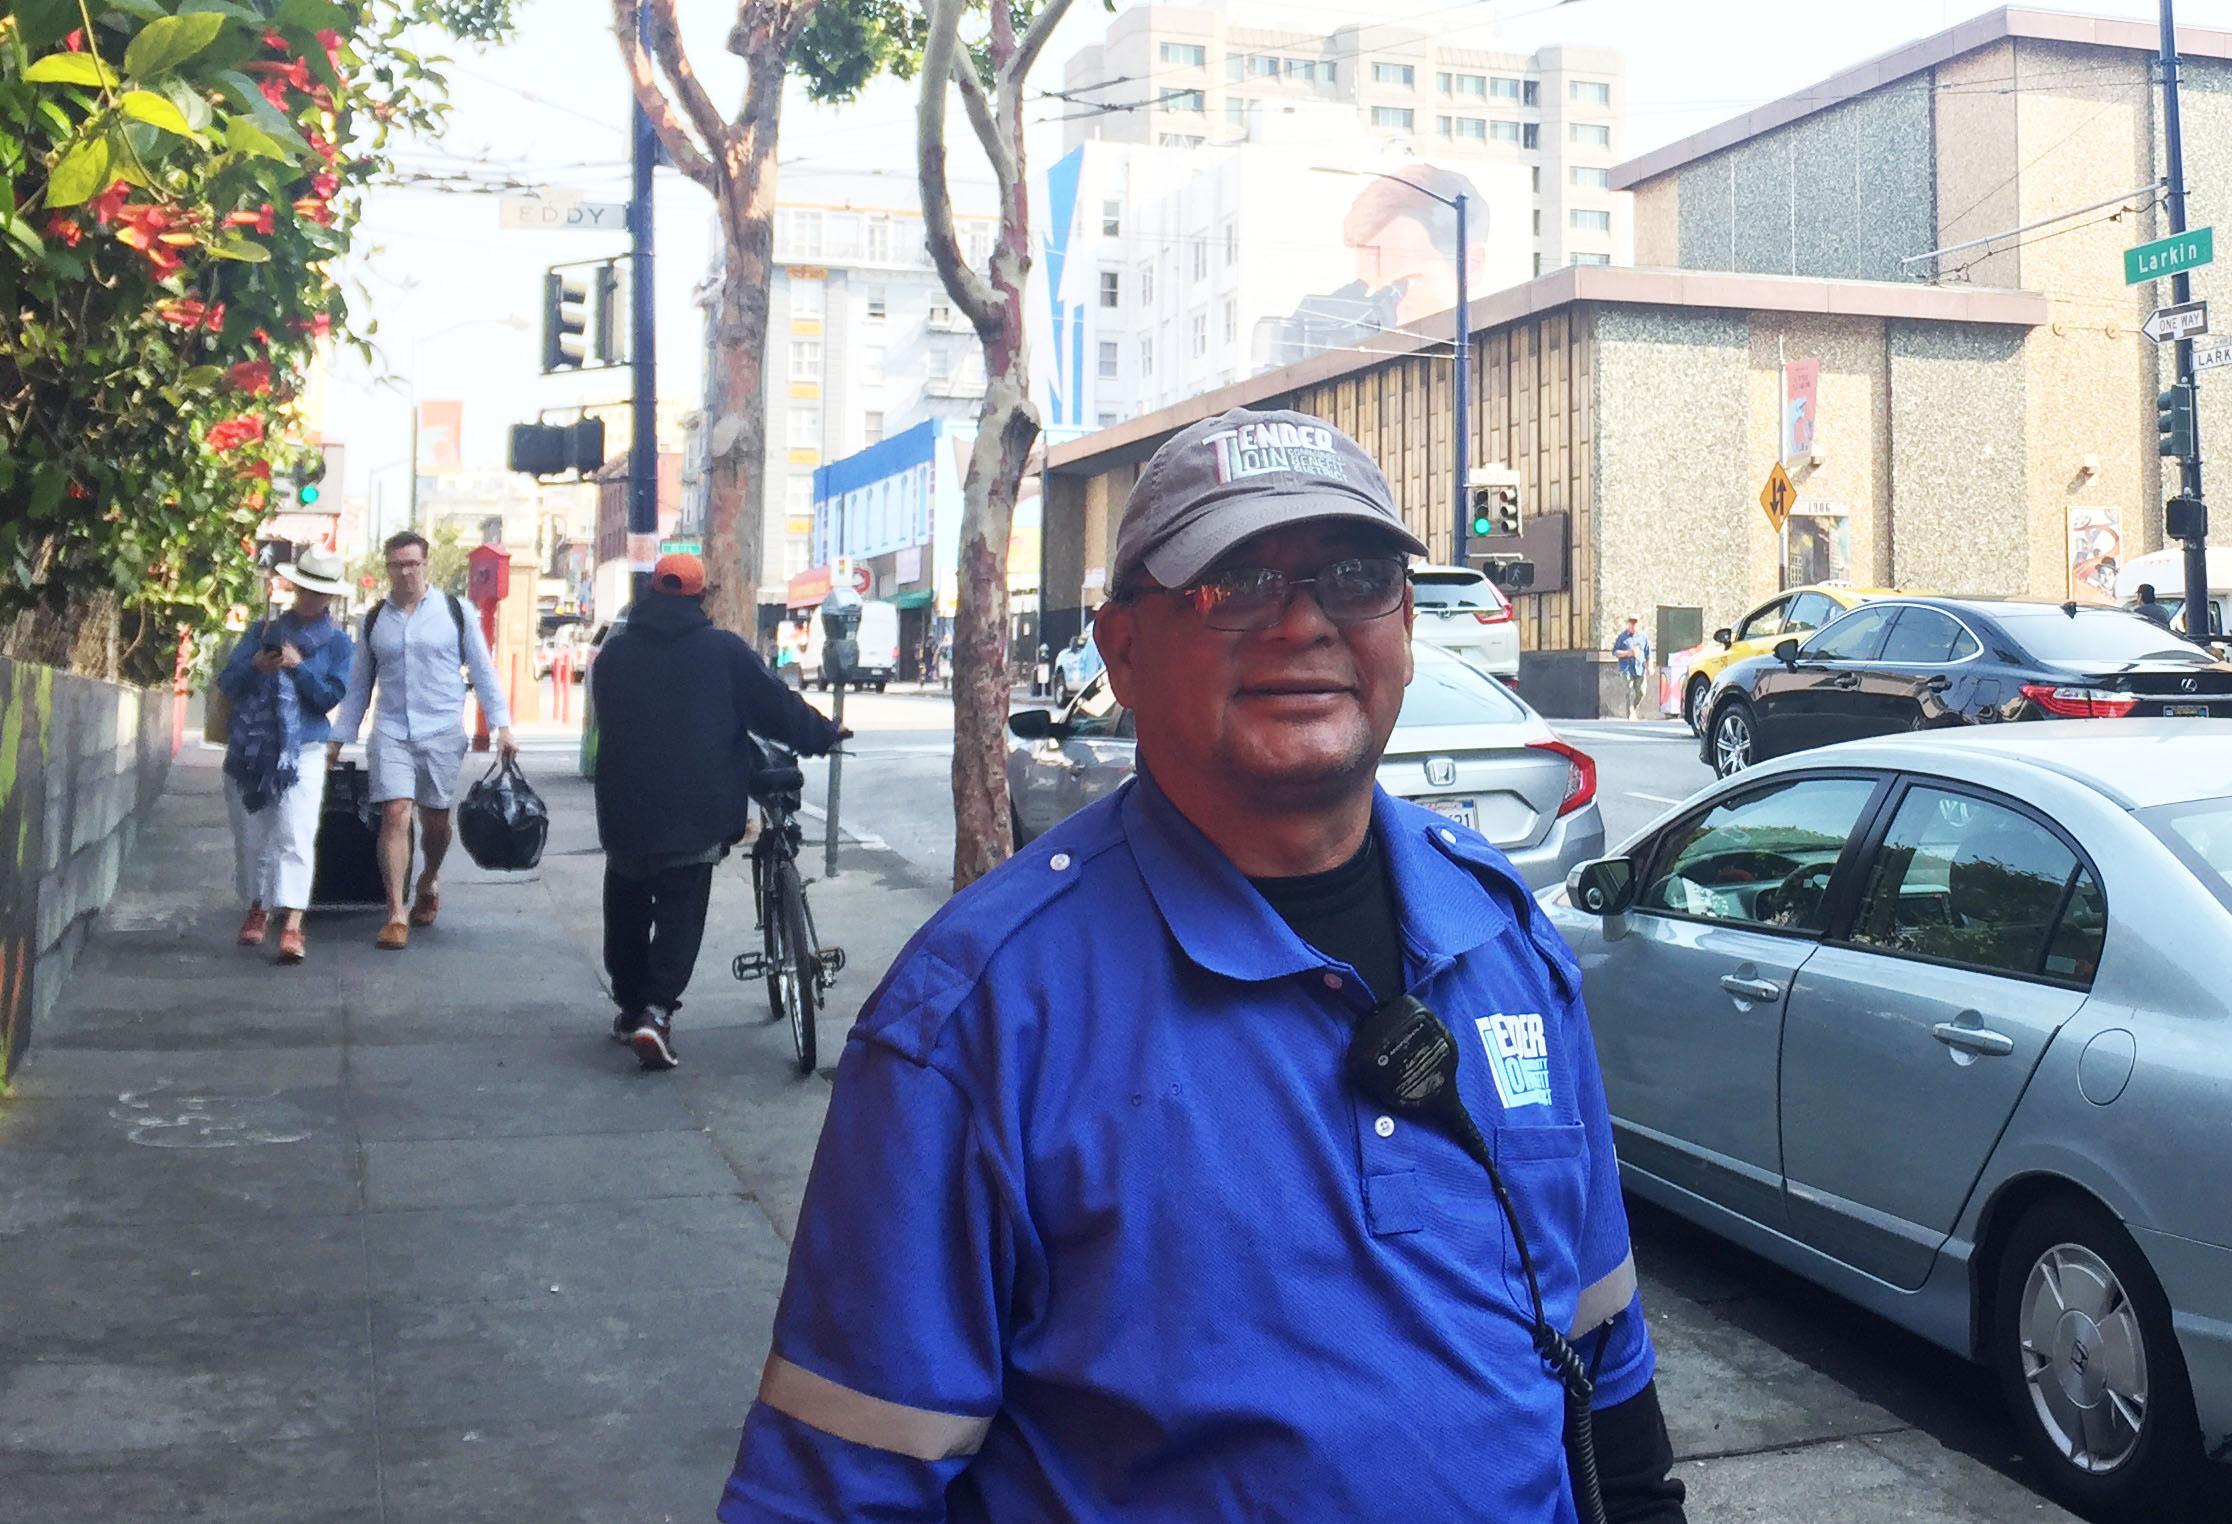 Meet Hector, our Larkin Street-LIttle Saigon Micro Neighborhood Clean Team member.